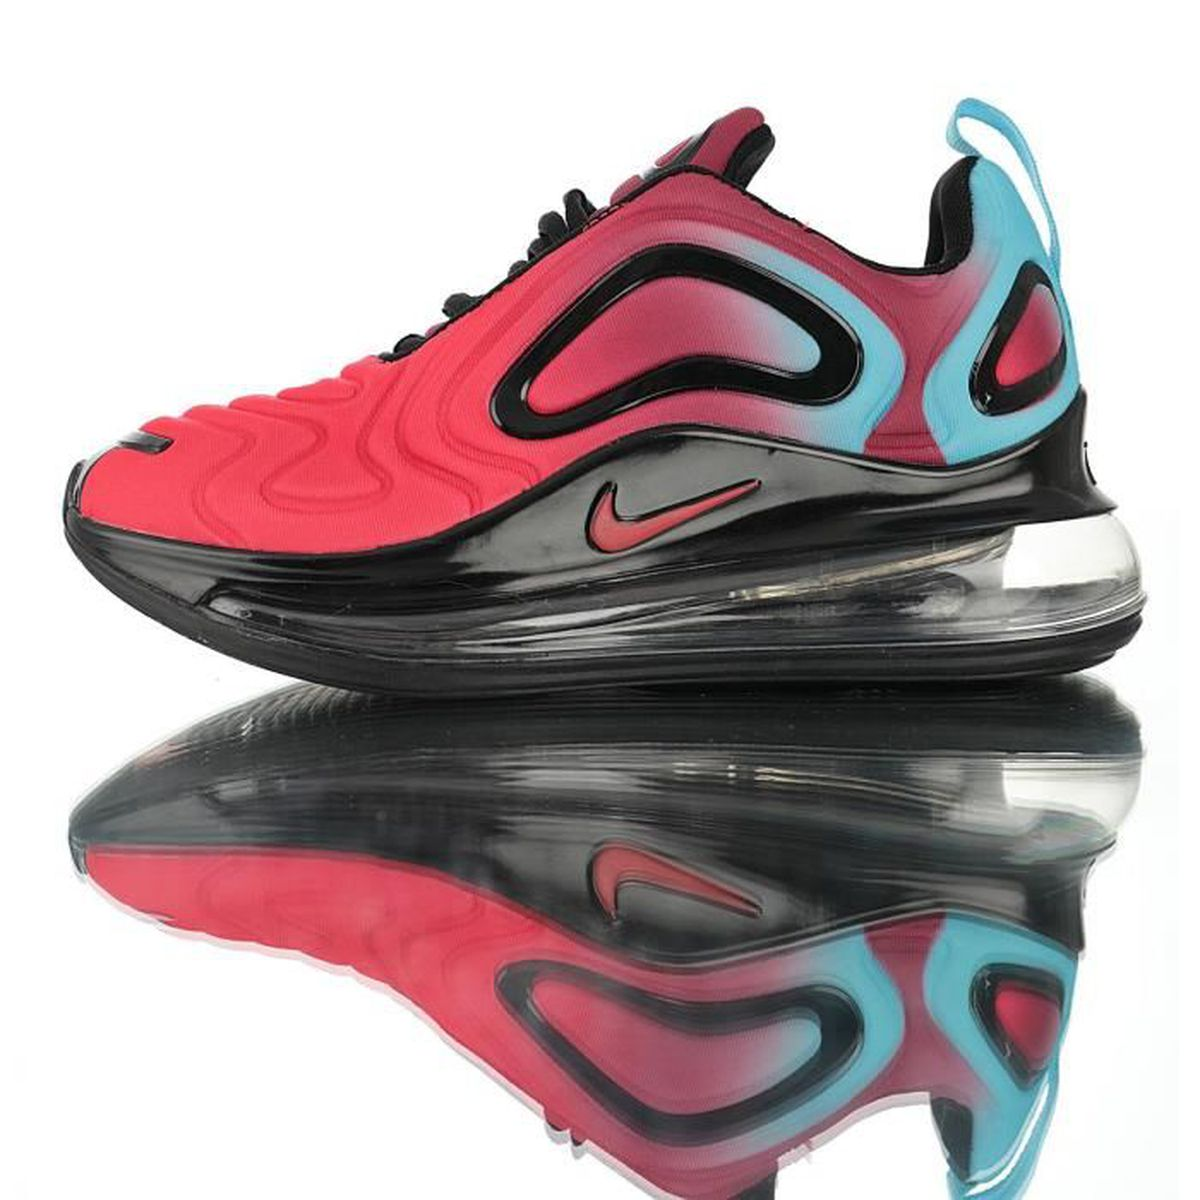 Max Femme Homme Et Rouge 720 Baskets Nike Air Noir vwOm8Nyn0